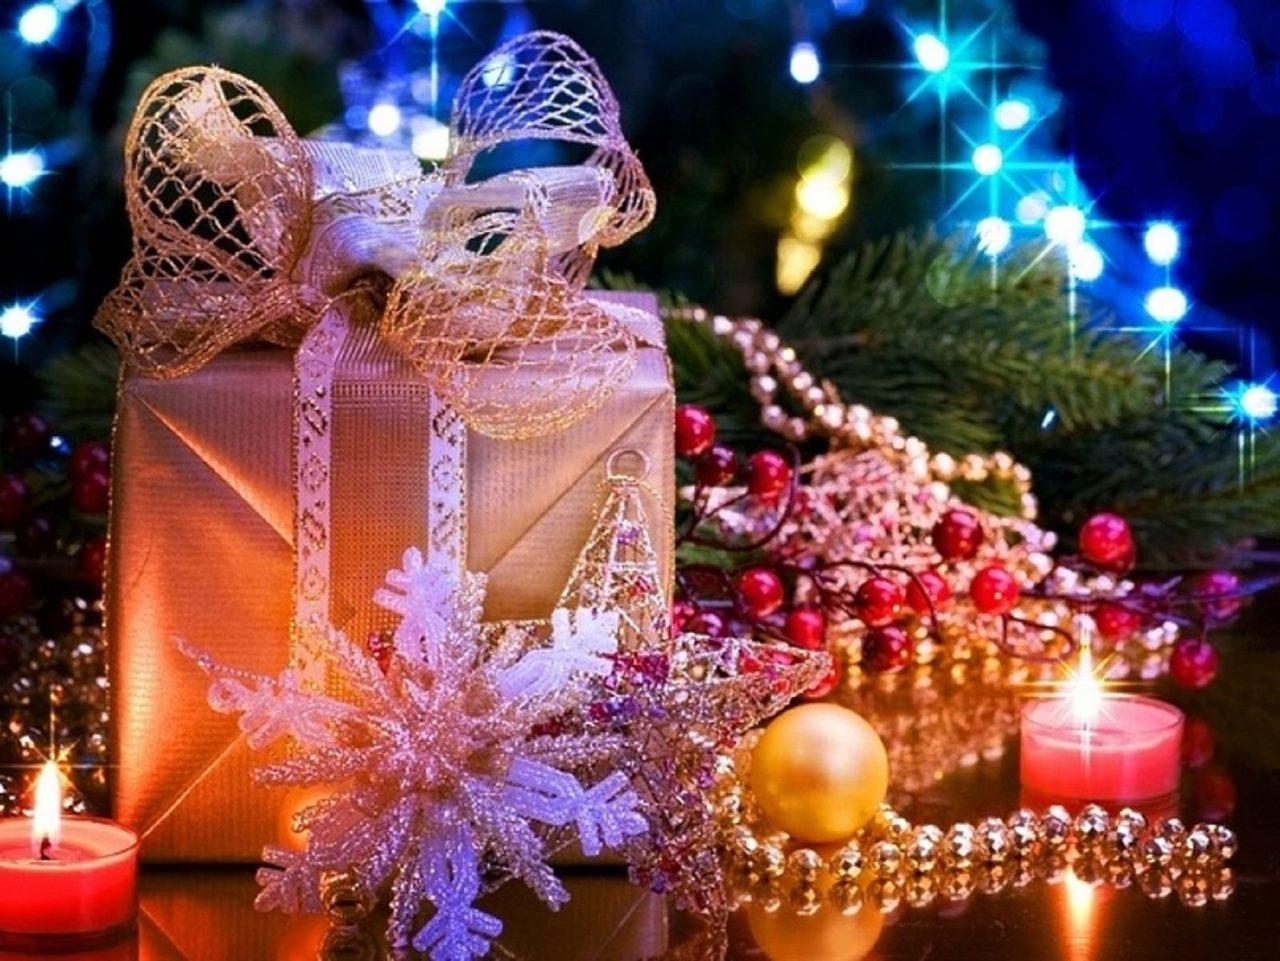 Christmas or Xmas?